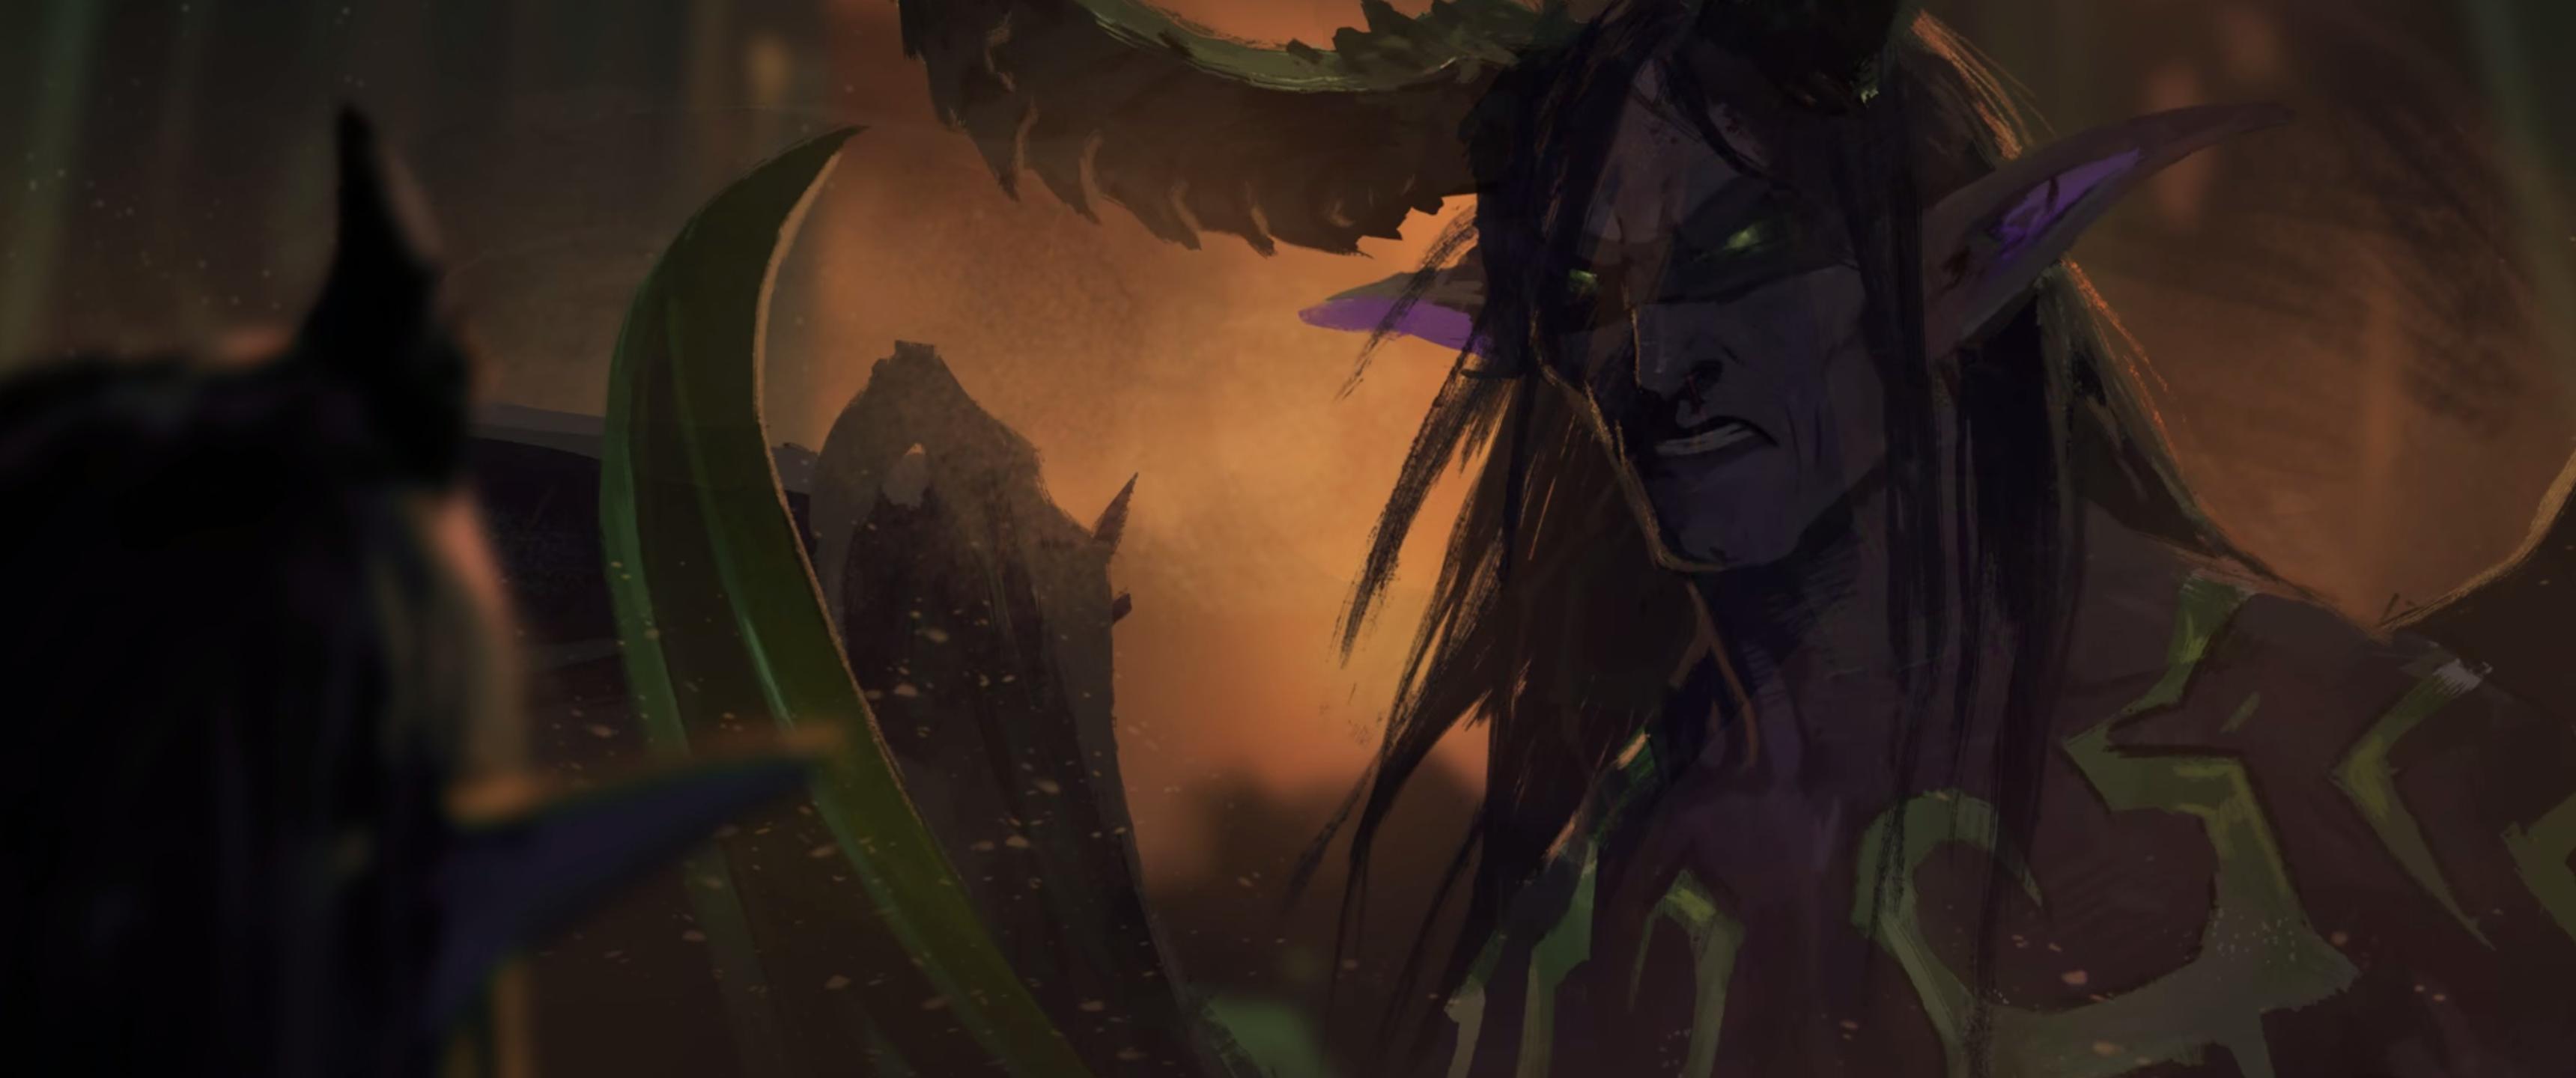 Wallpaper Anime World Of Warcraft Blizzard Entertainment